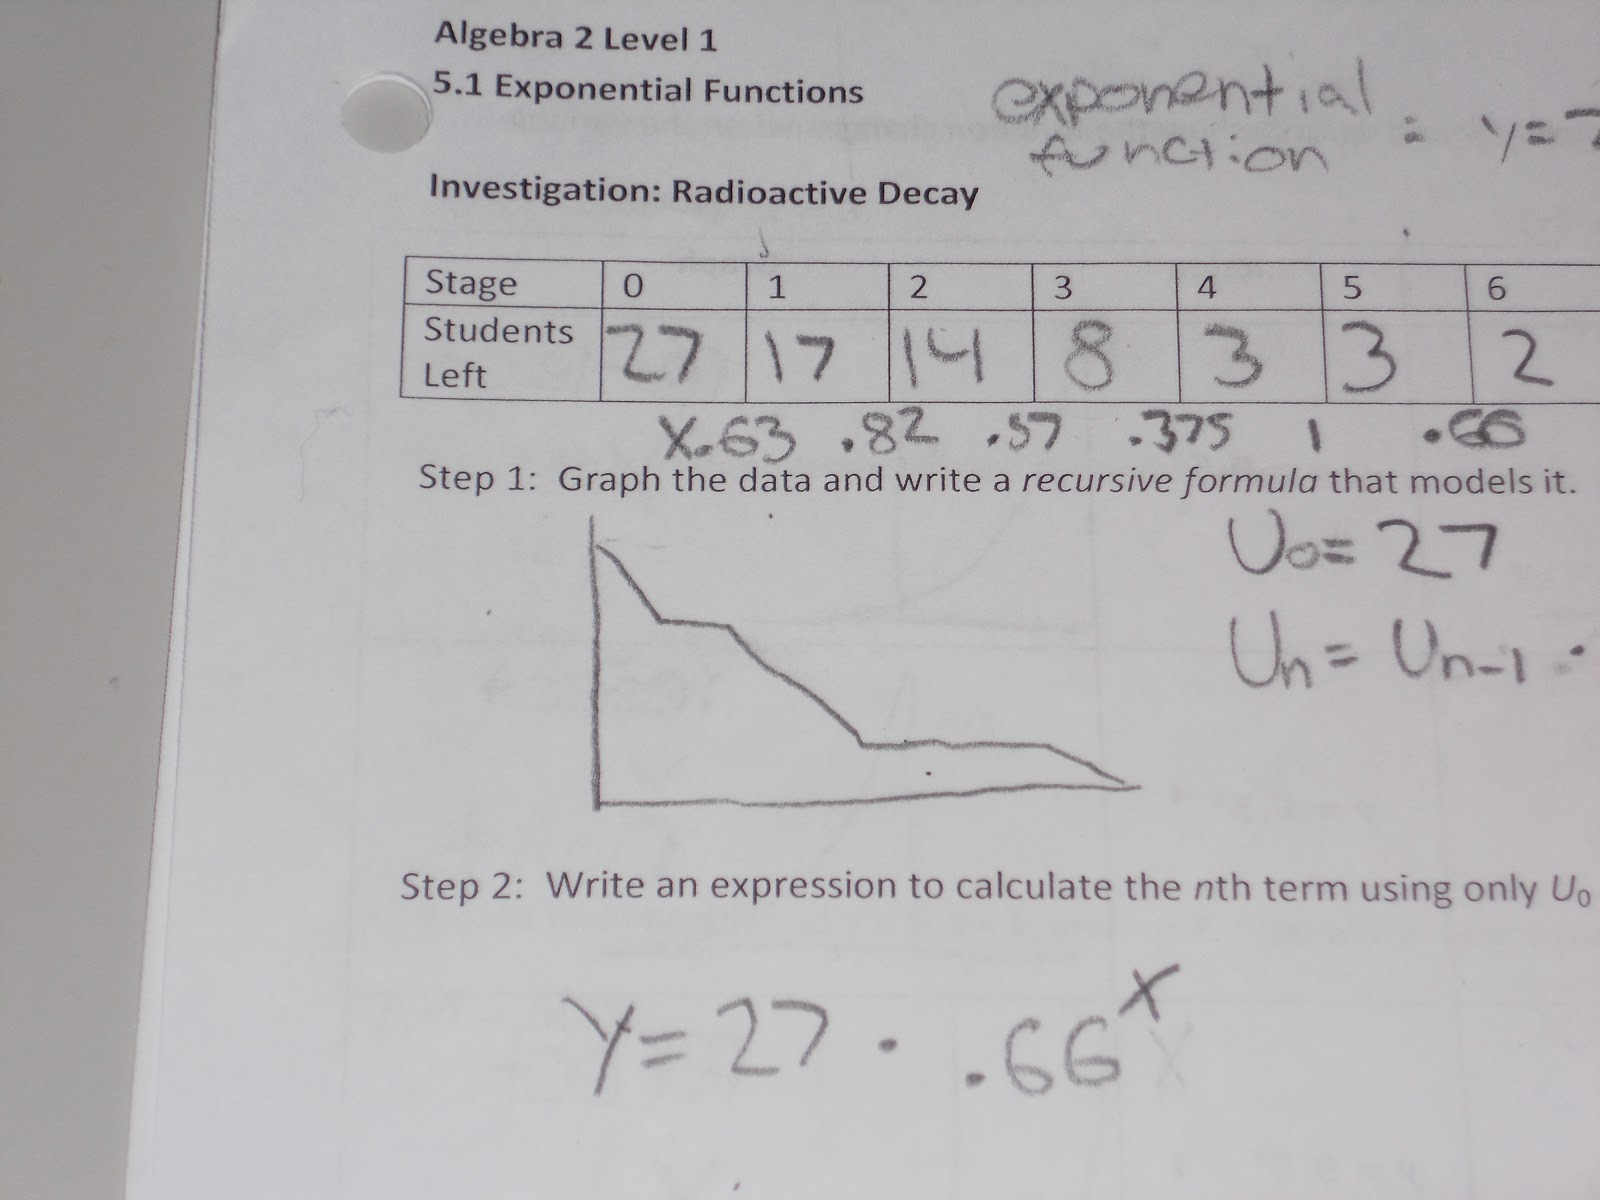 Pogact S White 1 Algebra 2 Level 1 Blog 5 1 Exponential Functions